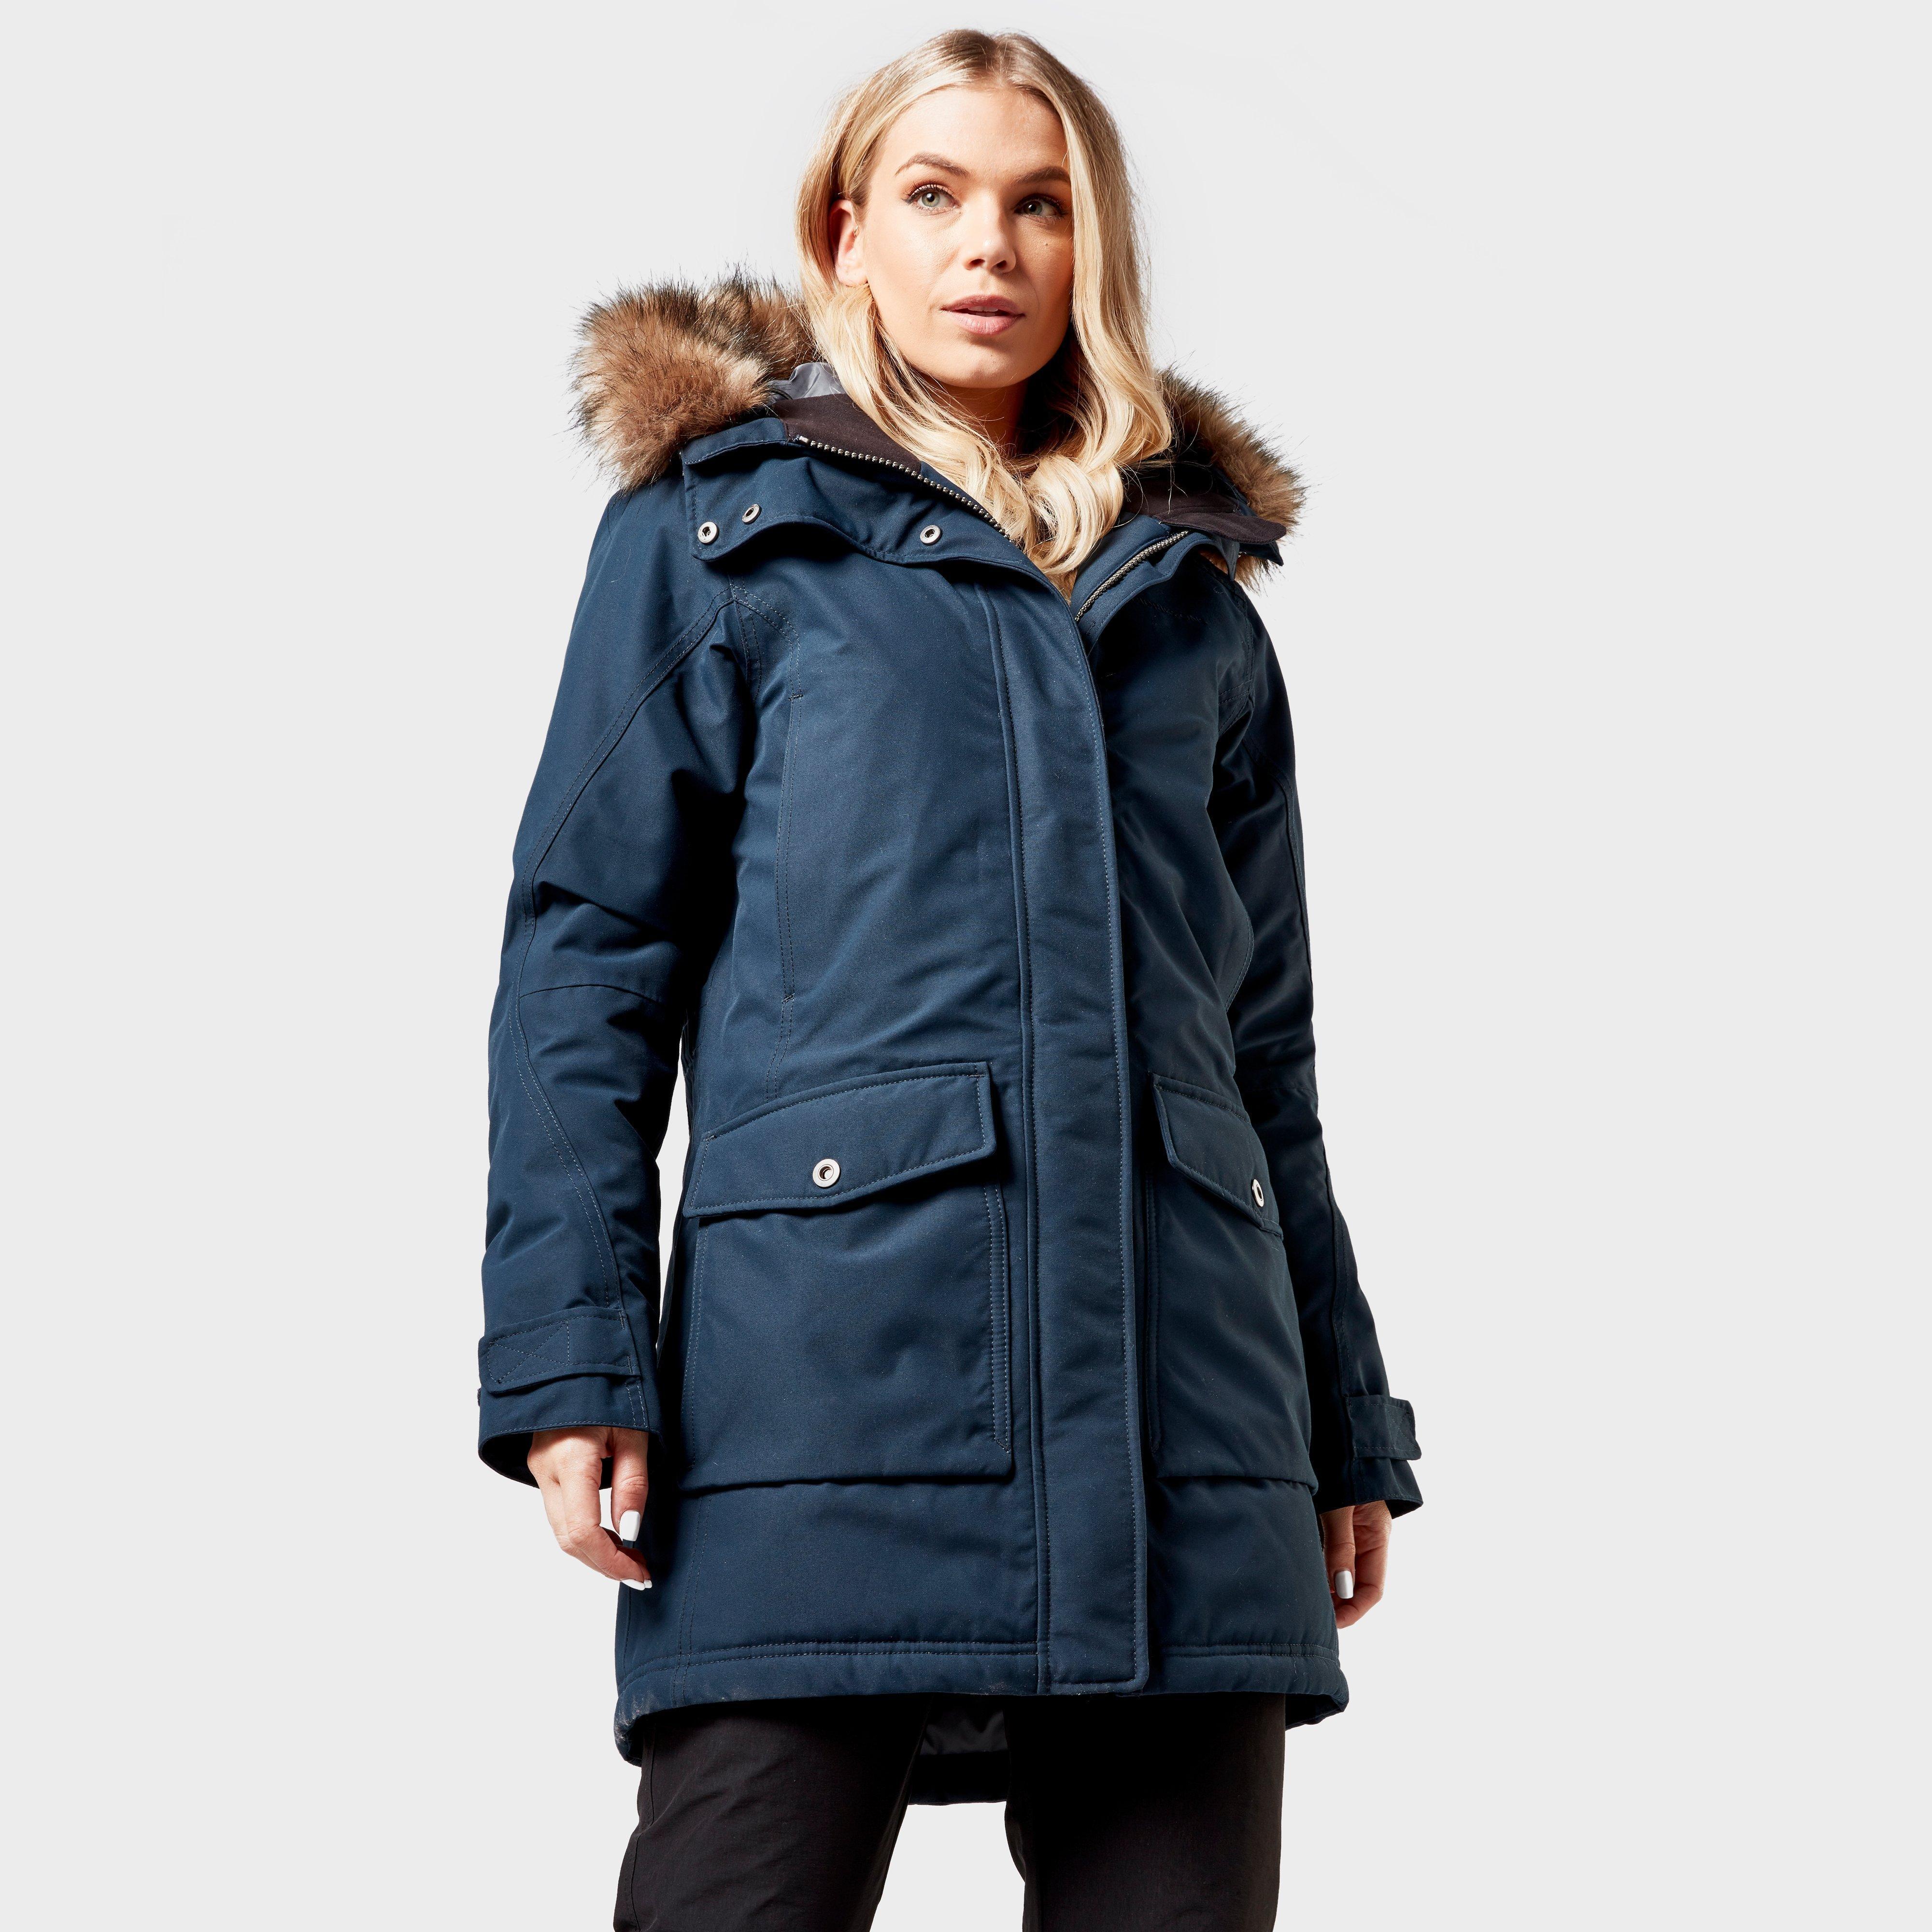 Didriksons Women's Vilda Waterproof Parka Coat, Navy